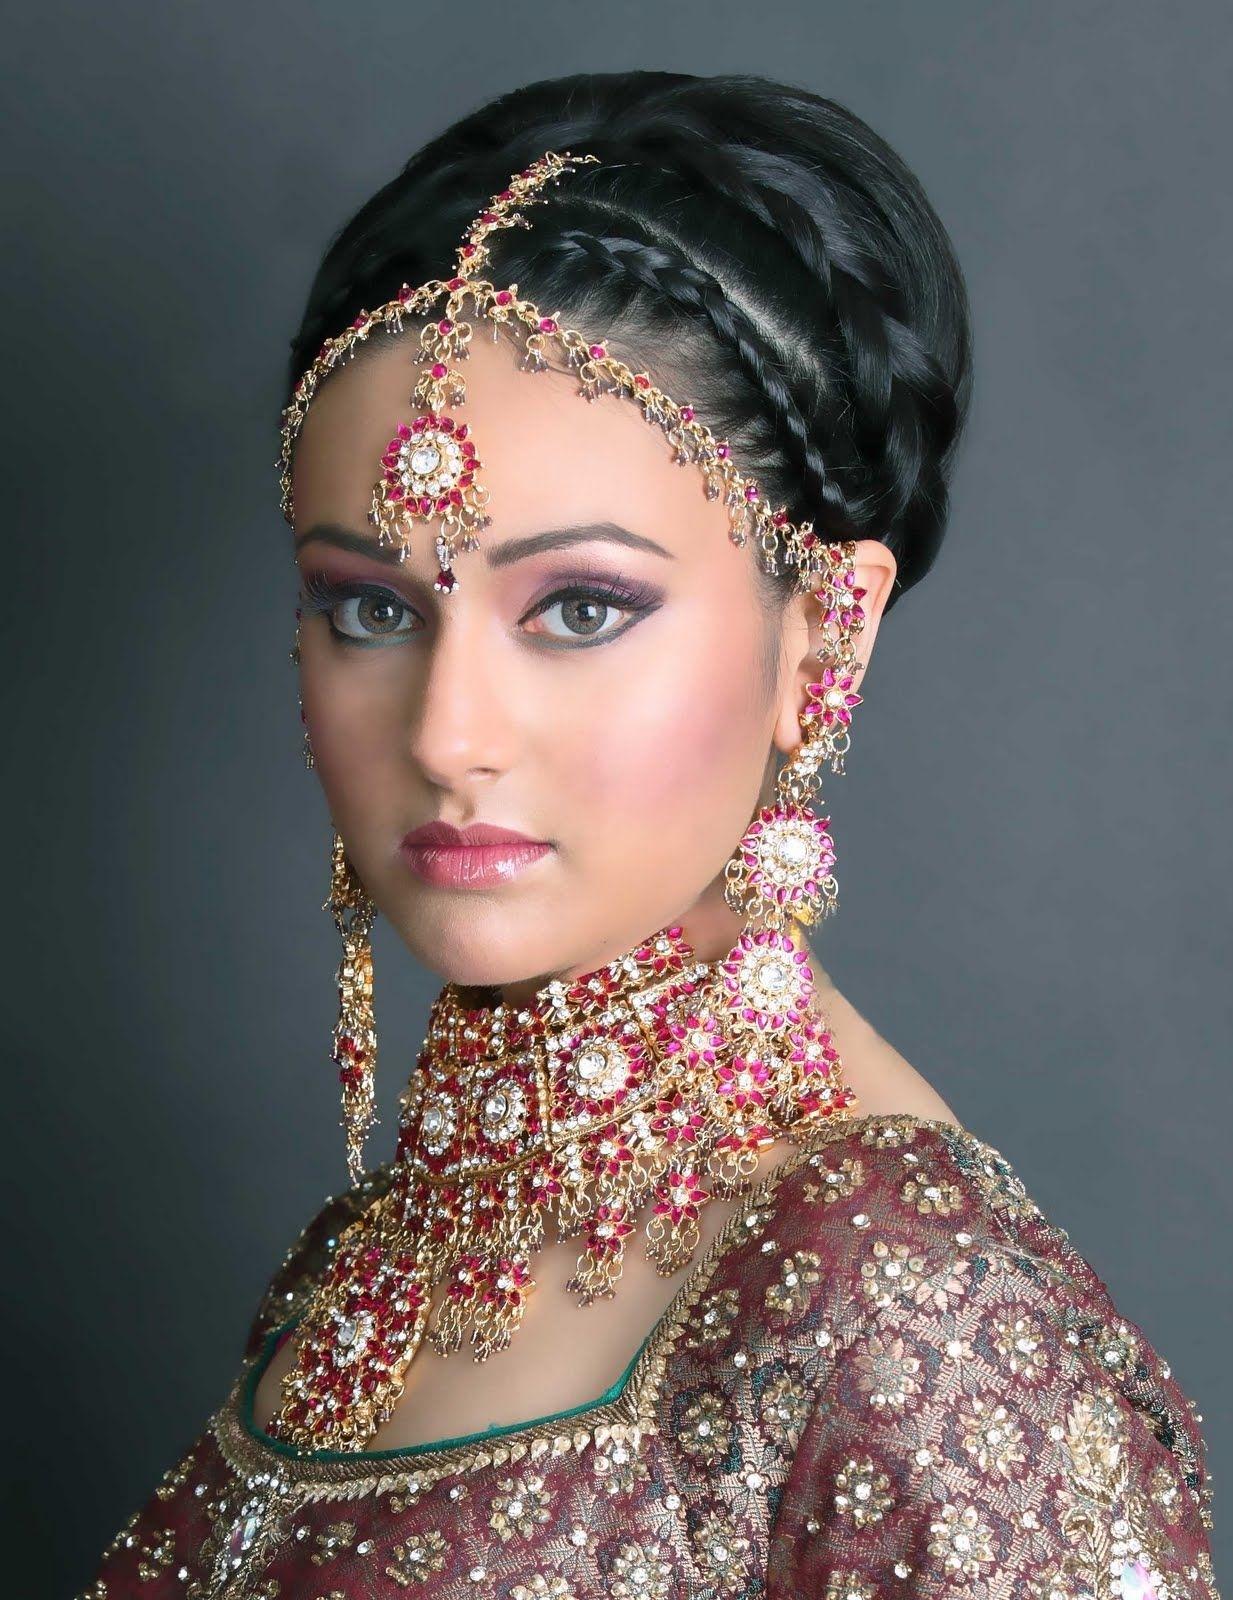 Indian Wedding Hairdos   Free Wallpapers Download, Desktop with regard to Indian Wedding Hairstyles Download